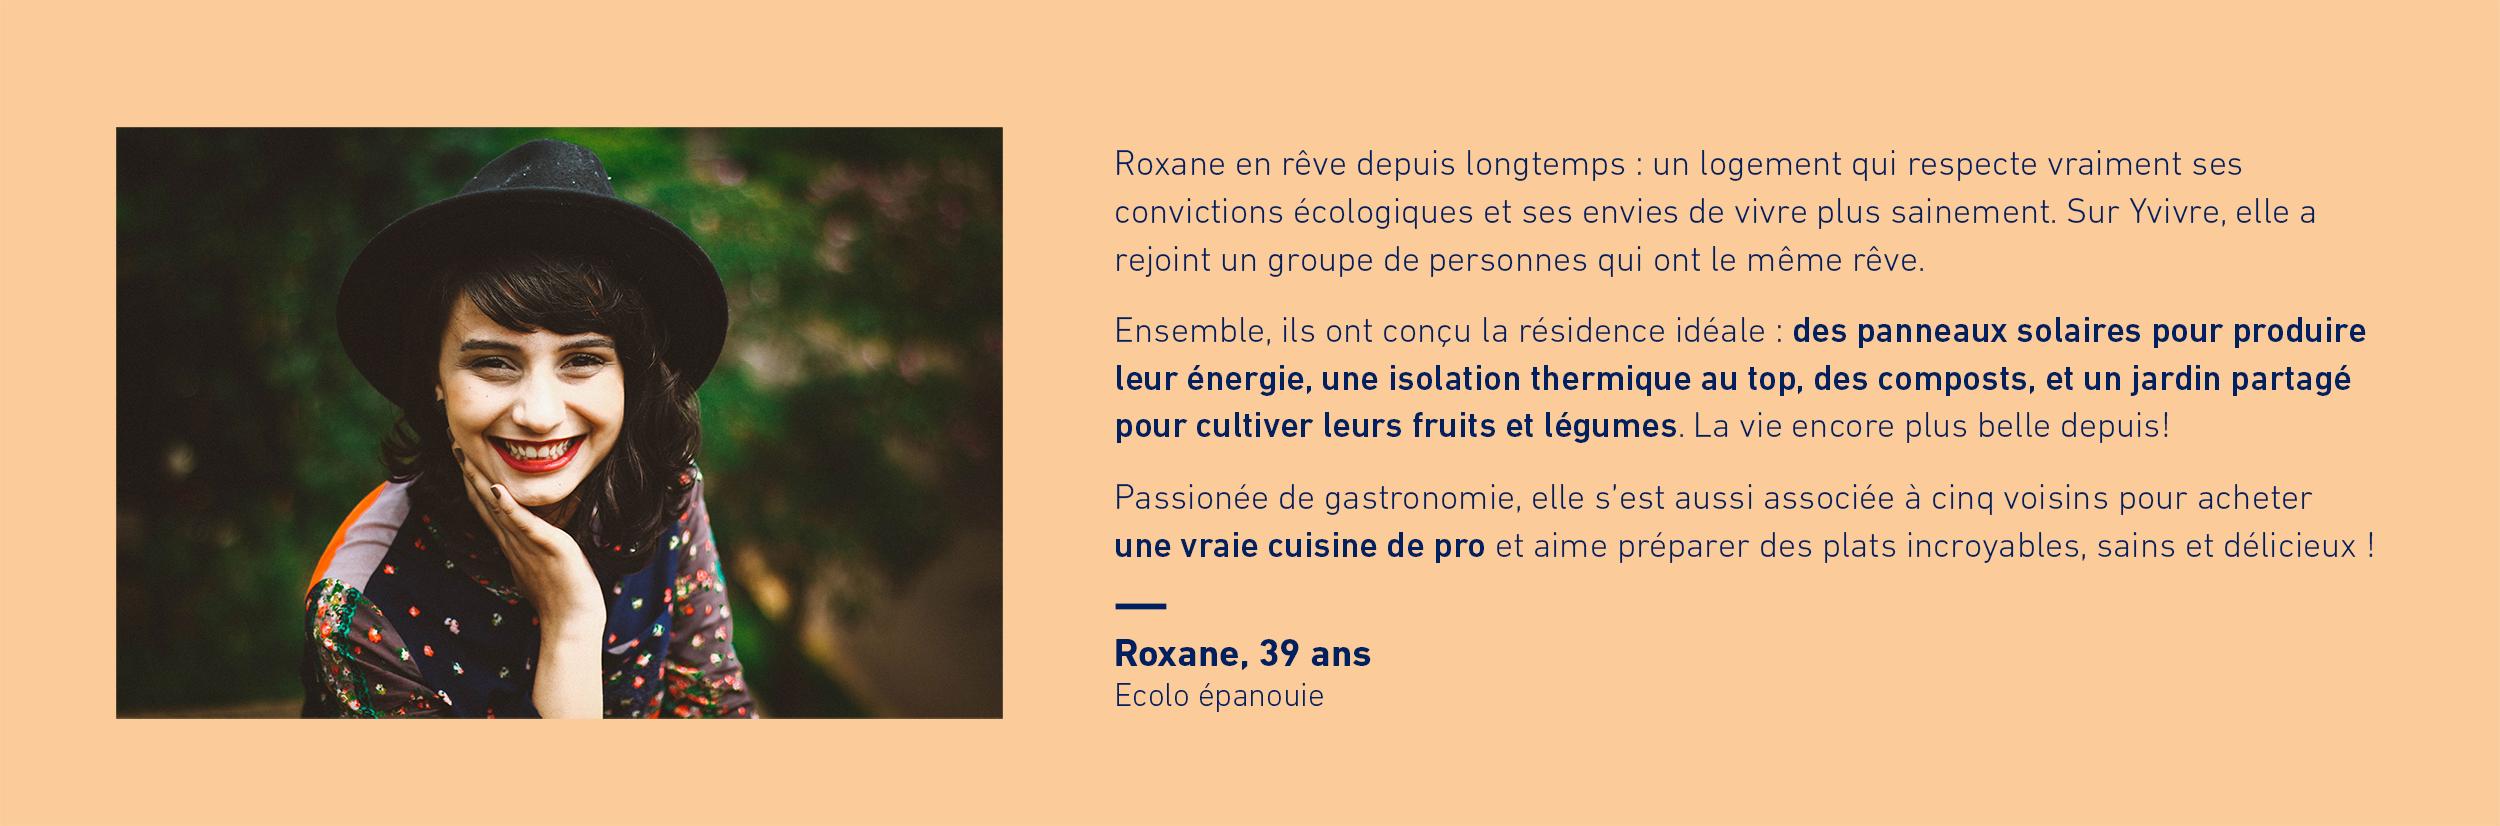 yvivre-avantages-testimonial-roxane-2